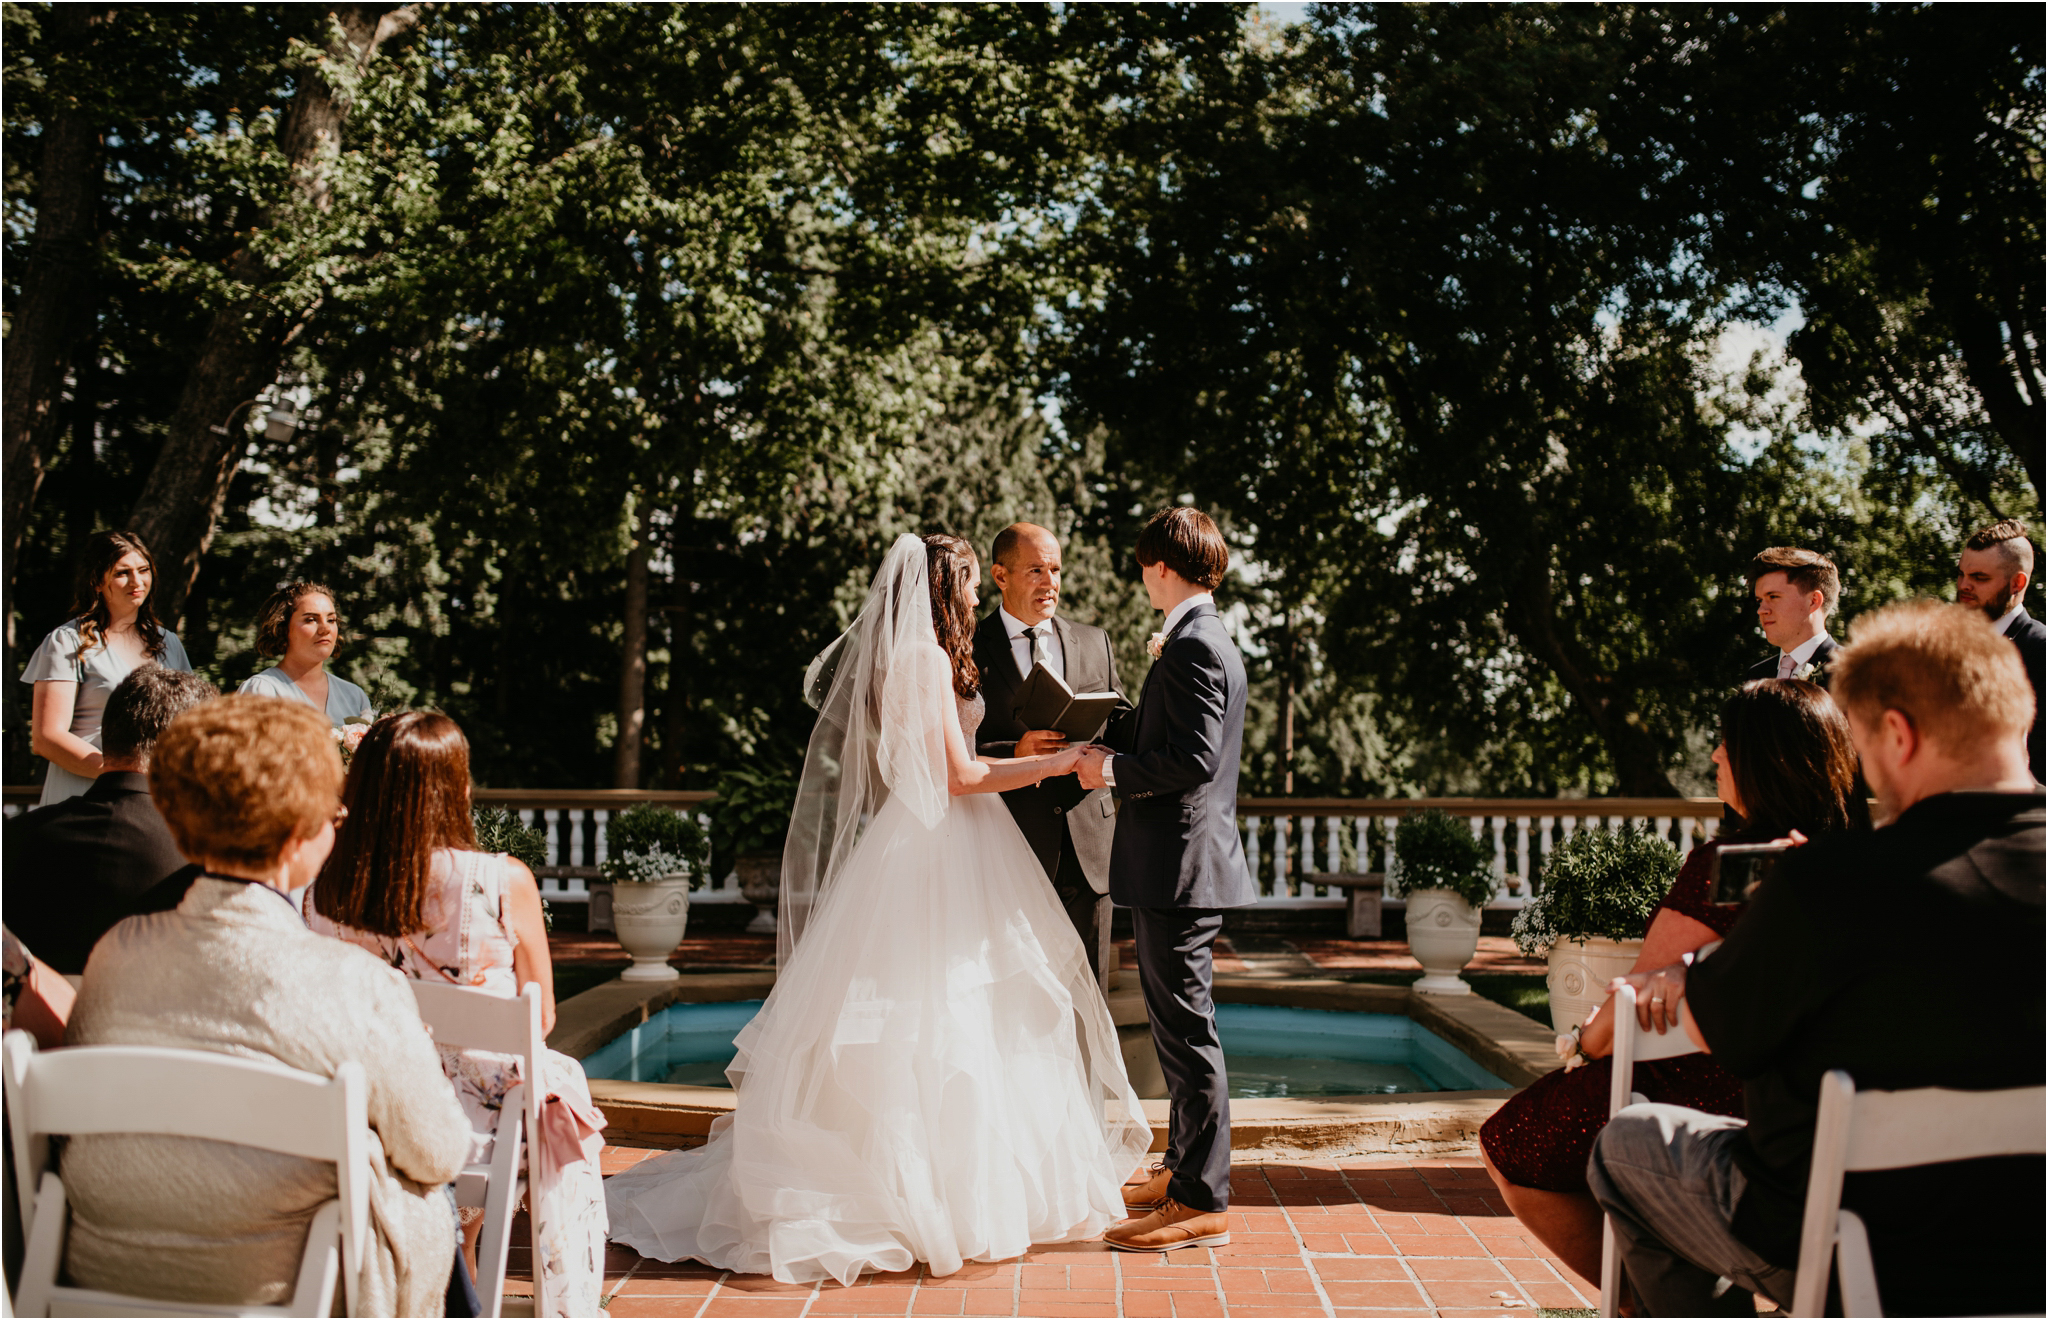 chance-and-ondrea-lairmont-manor-wedding-seattle-photographer-081.jpg